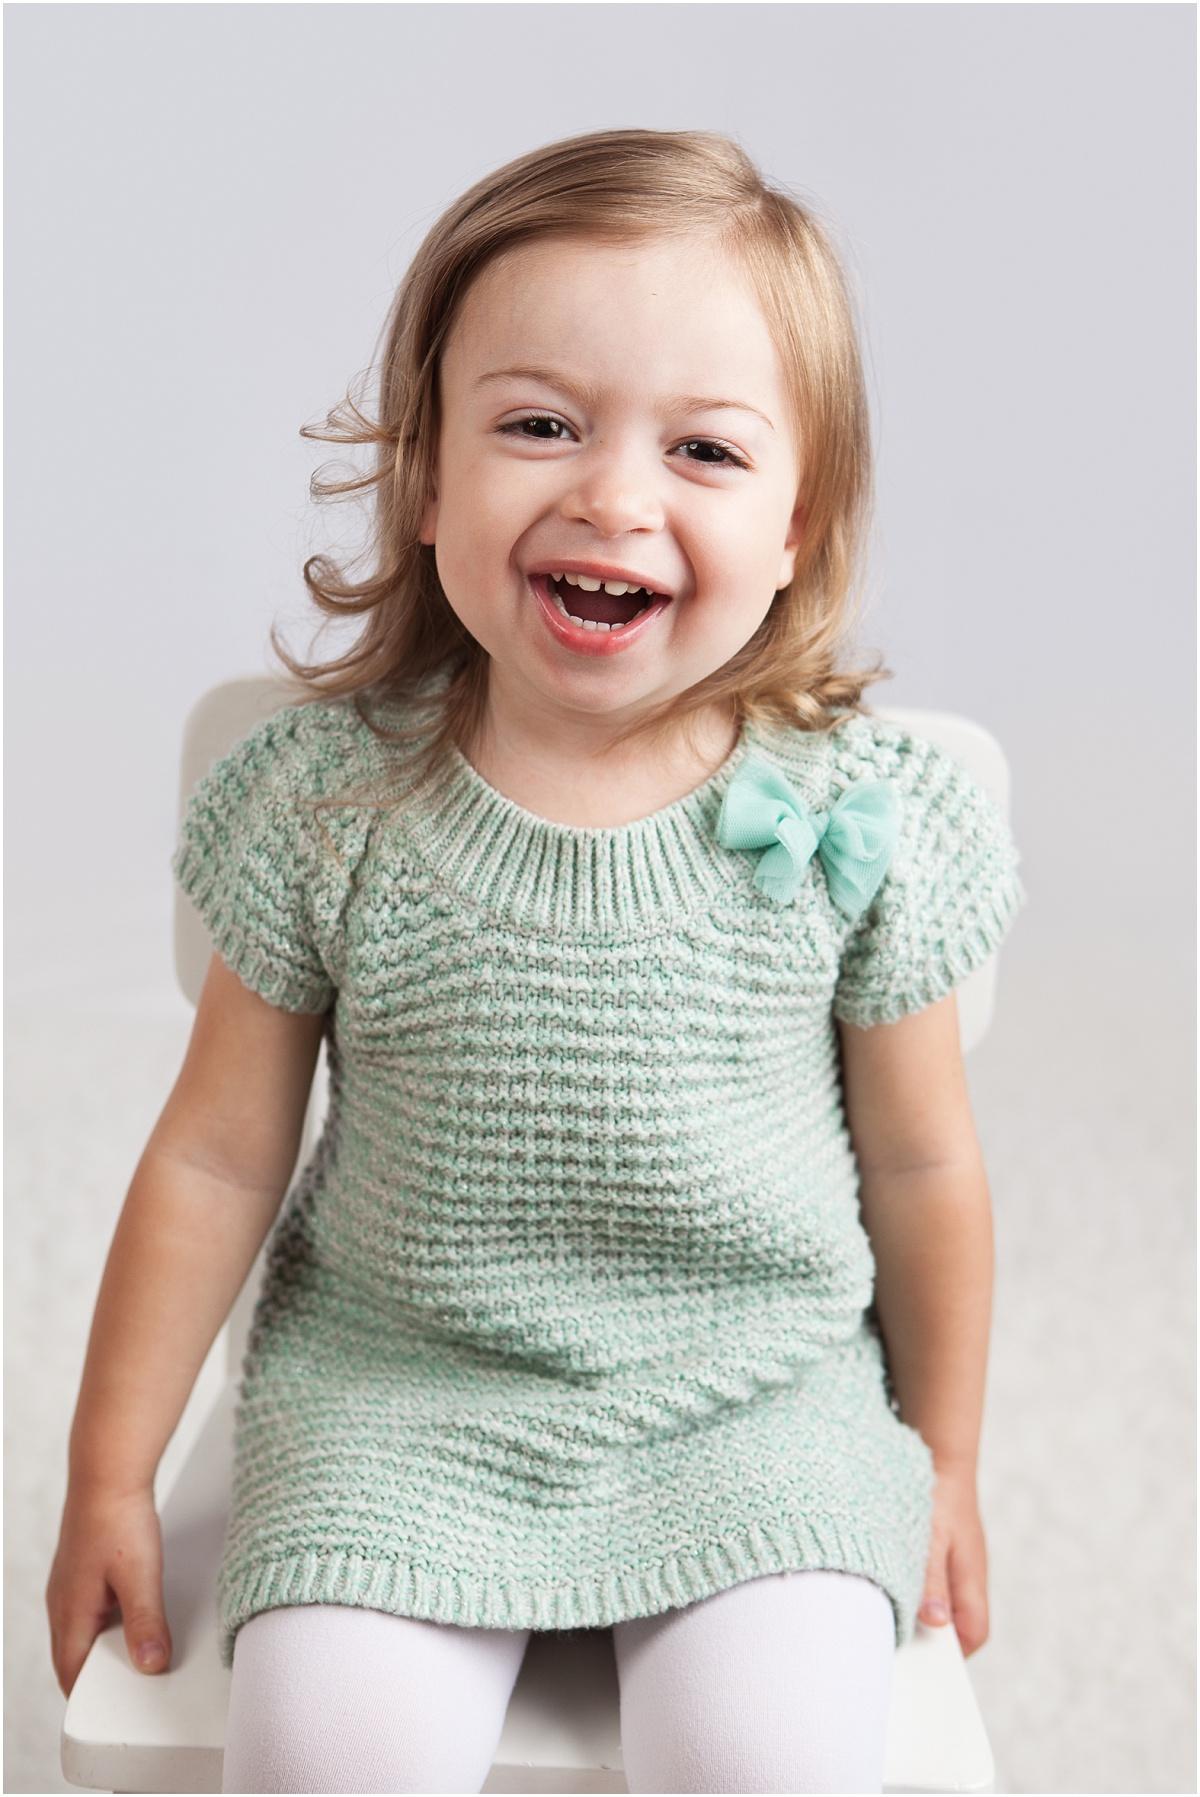 Portraits_Child Photography_Meridian Idaho__Leah Southwick Photography_0092.jpg